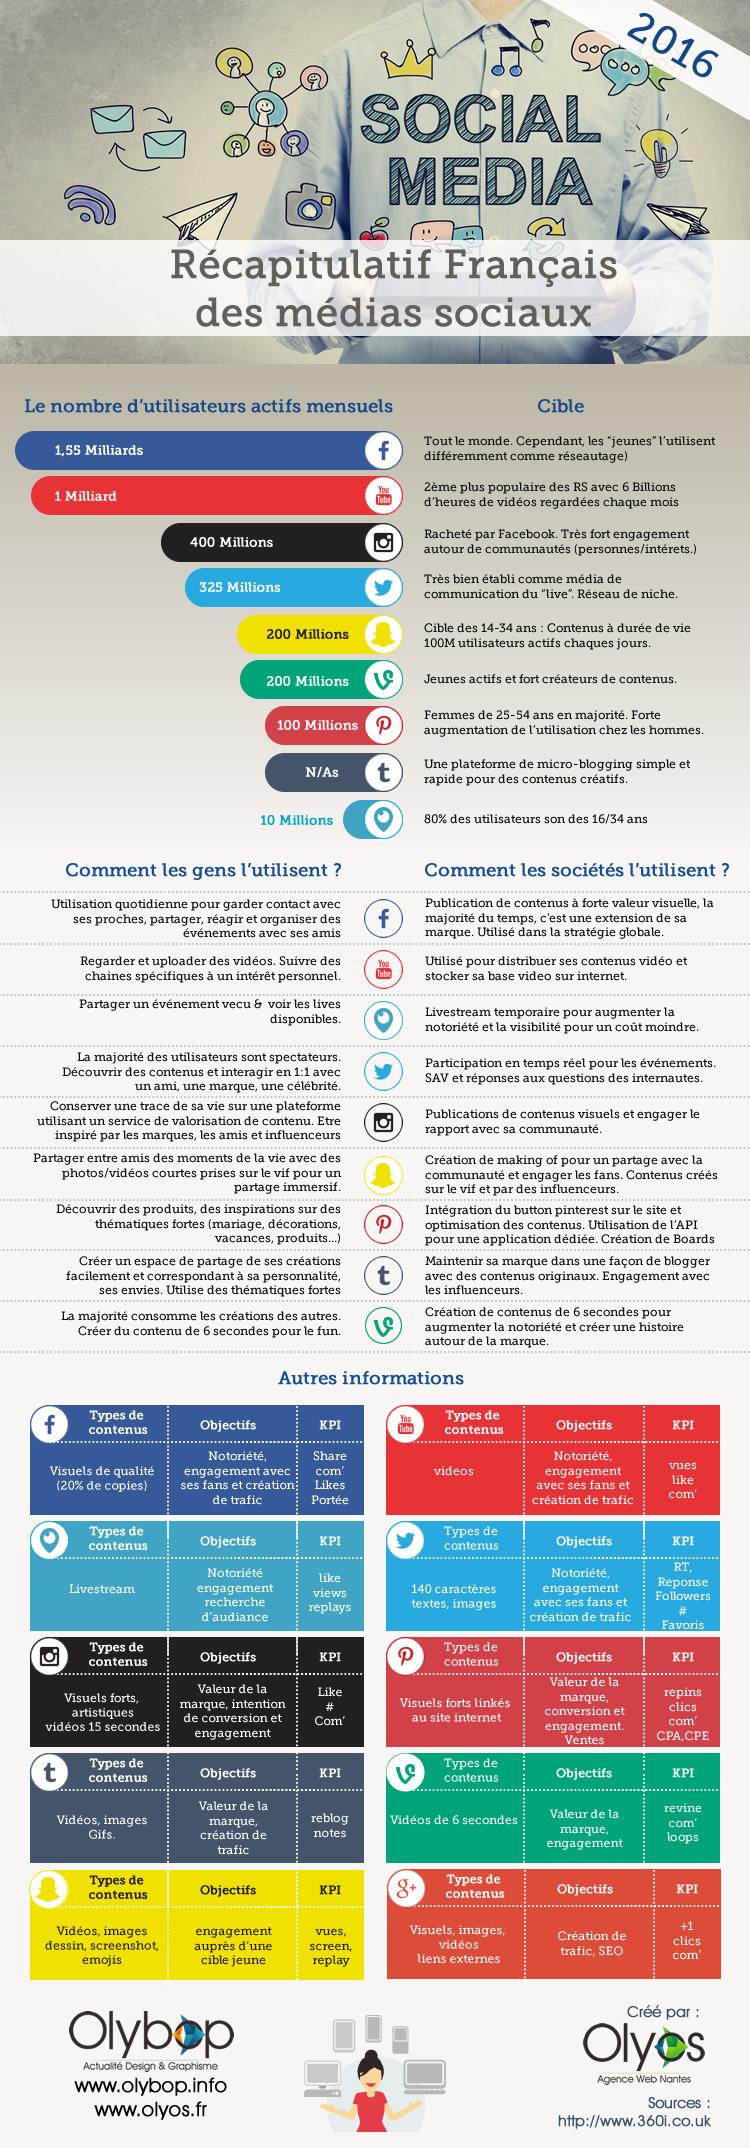 infographie-reseau-sociaux-2016-olyos